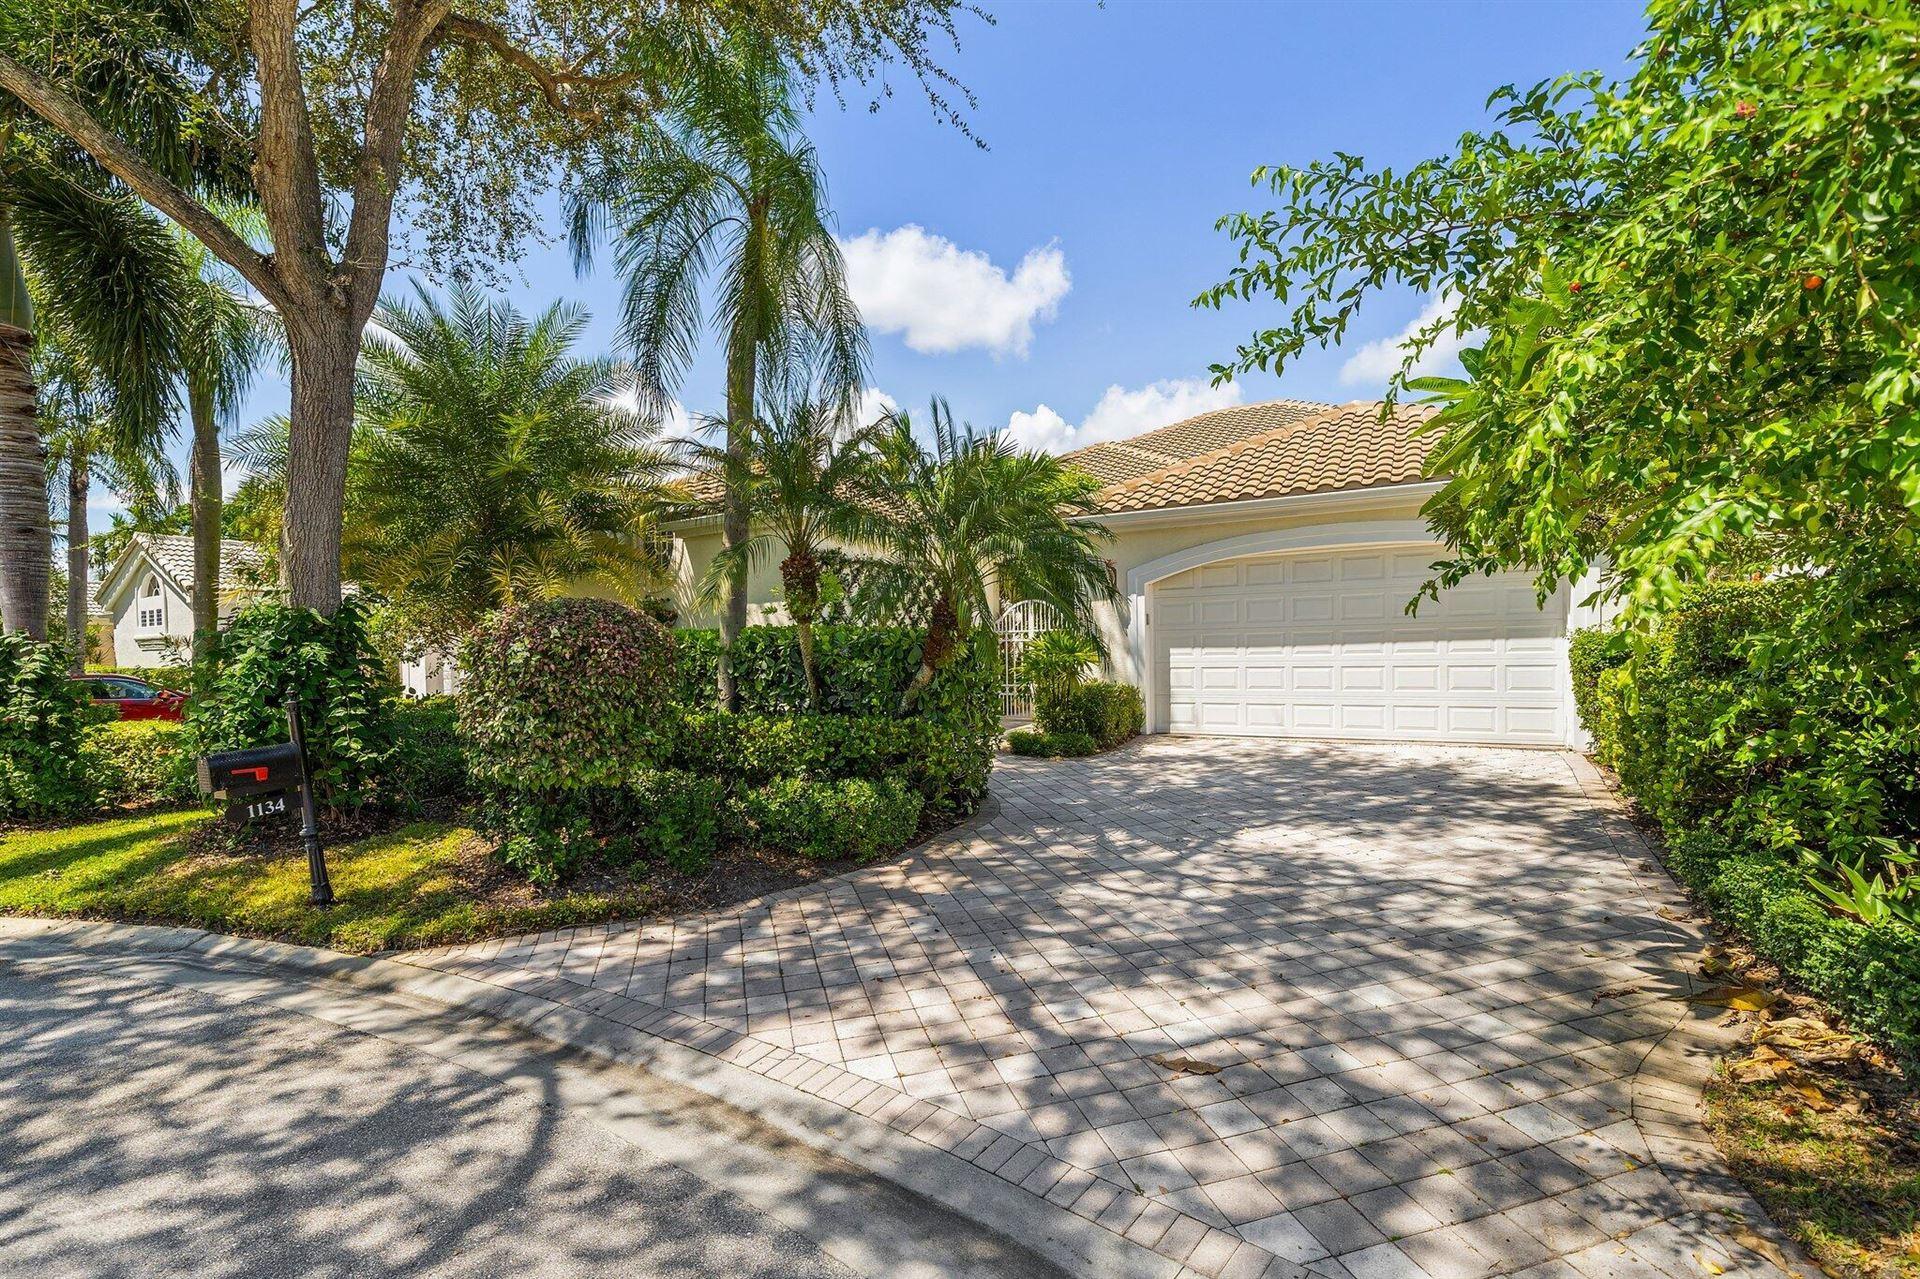 Photo of 1134 Crystal Drive, Palm Beach Gardens, FL 33418 (MLS # RX-10746271)